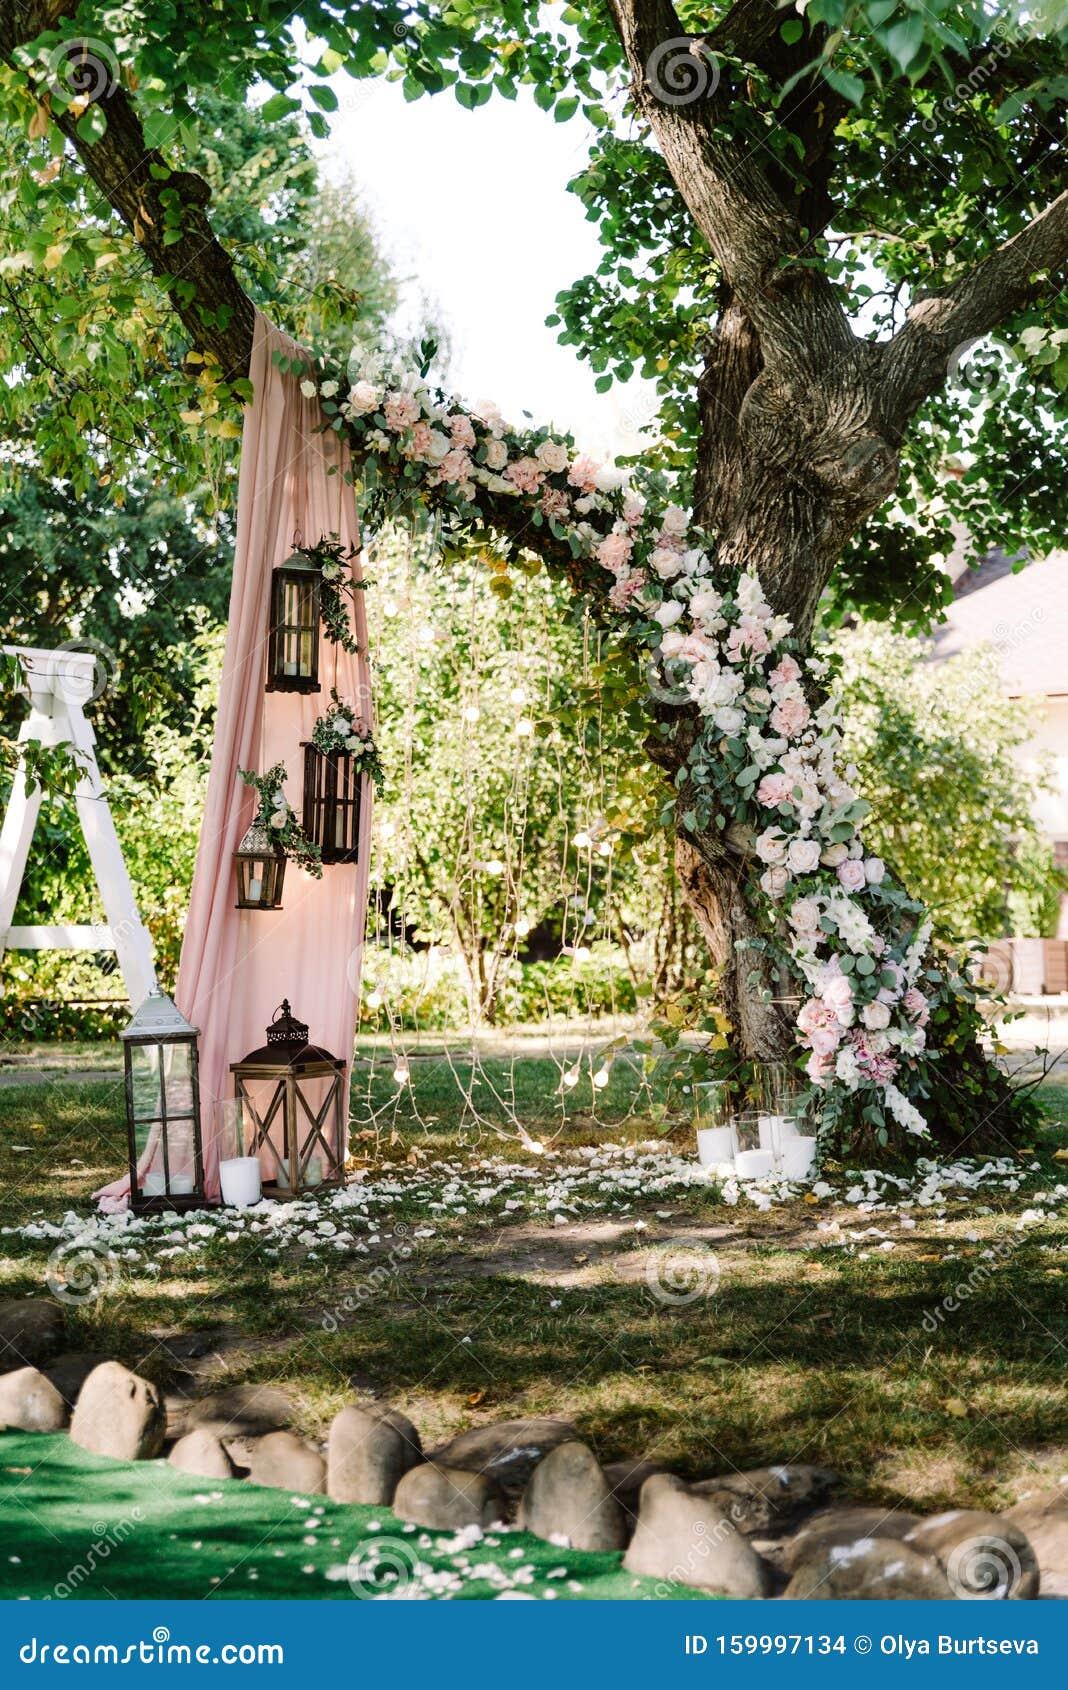 Natural Decor For Summer Elegant Wedding Outdoors Wedding Ceremony Near The Tree Stock Photo Image Of Dinner Decor 159997134